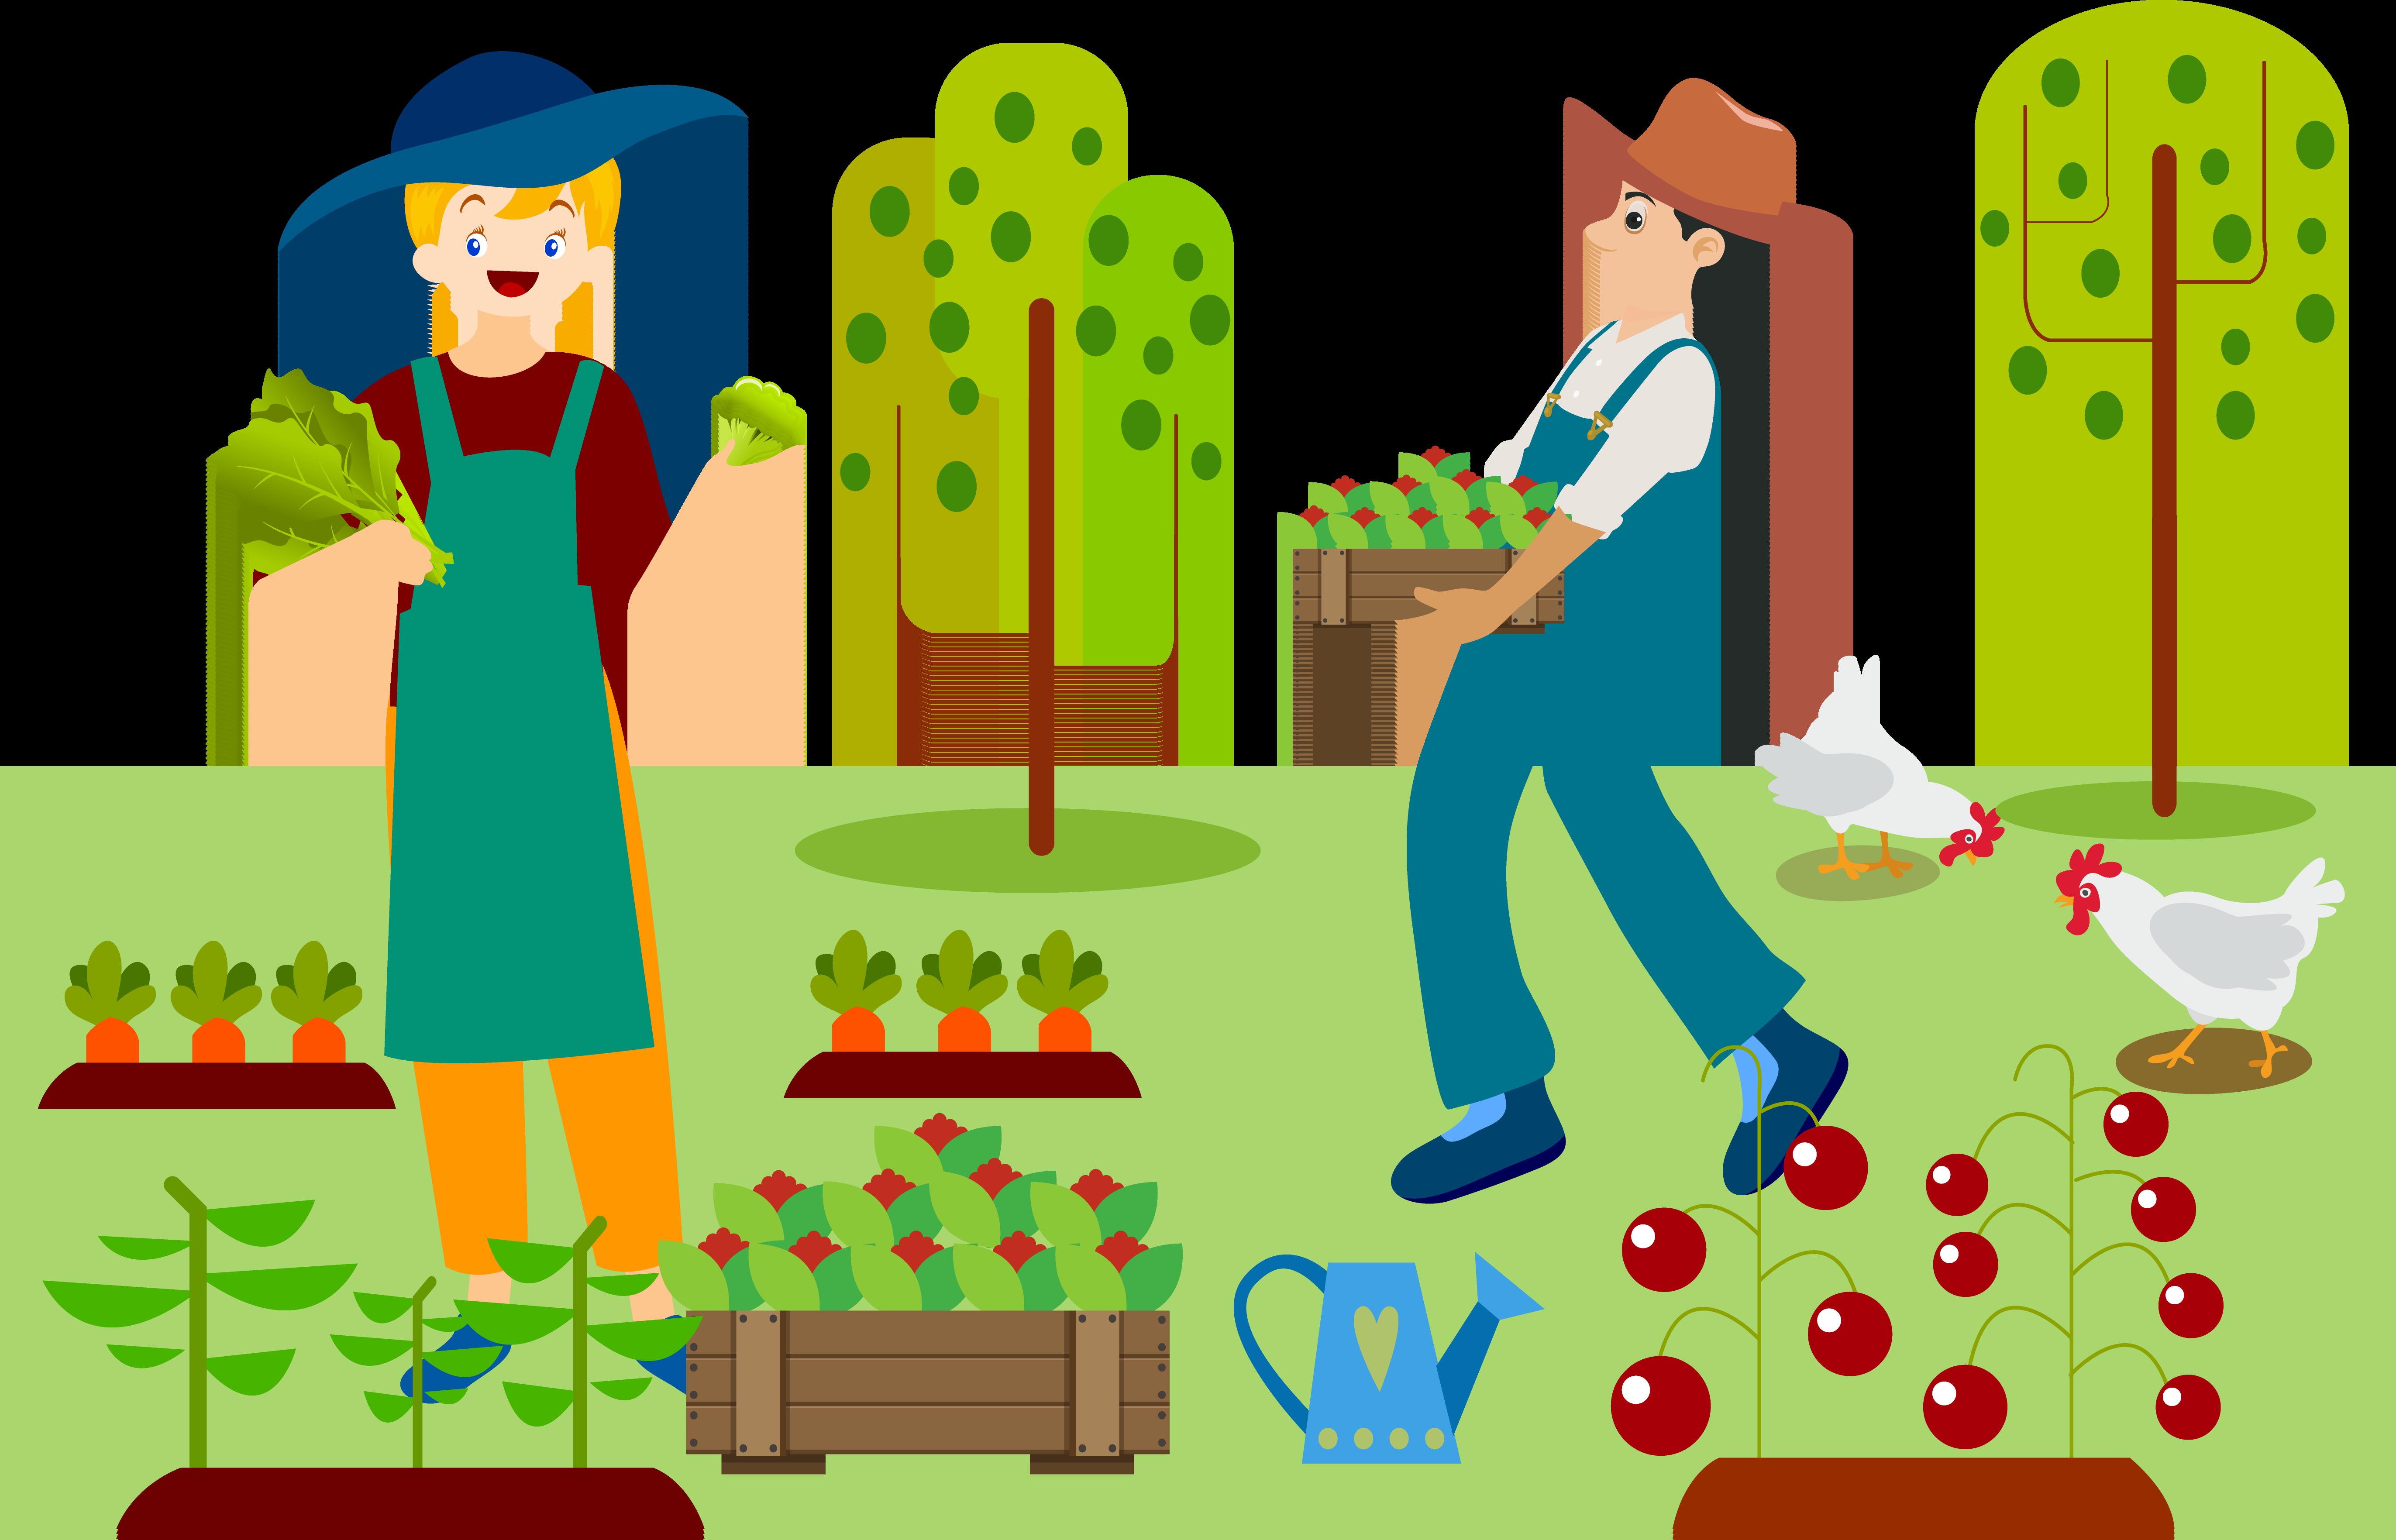 Farming clipart organic farming, Farming organic farming.